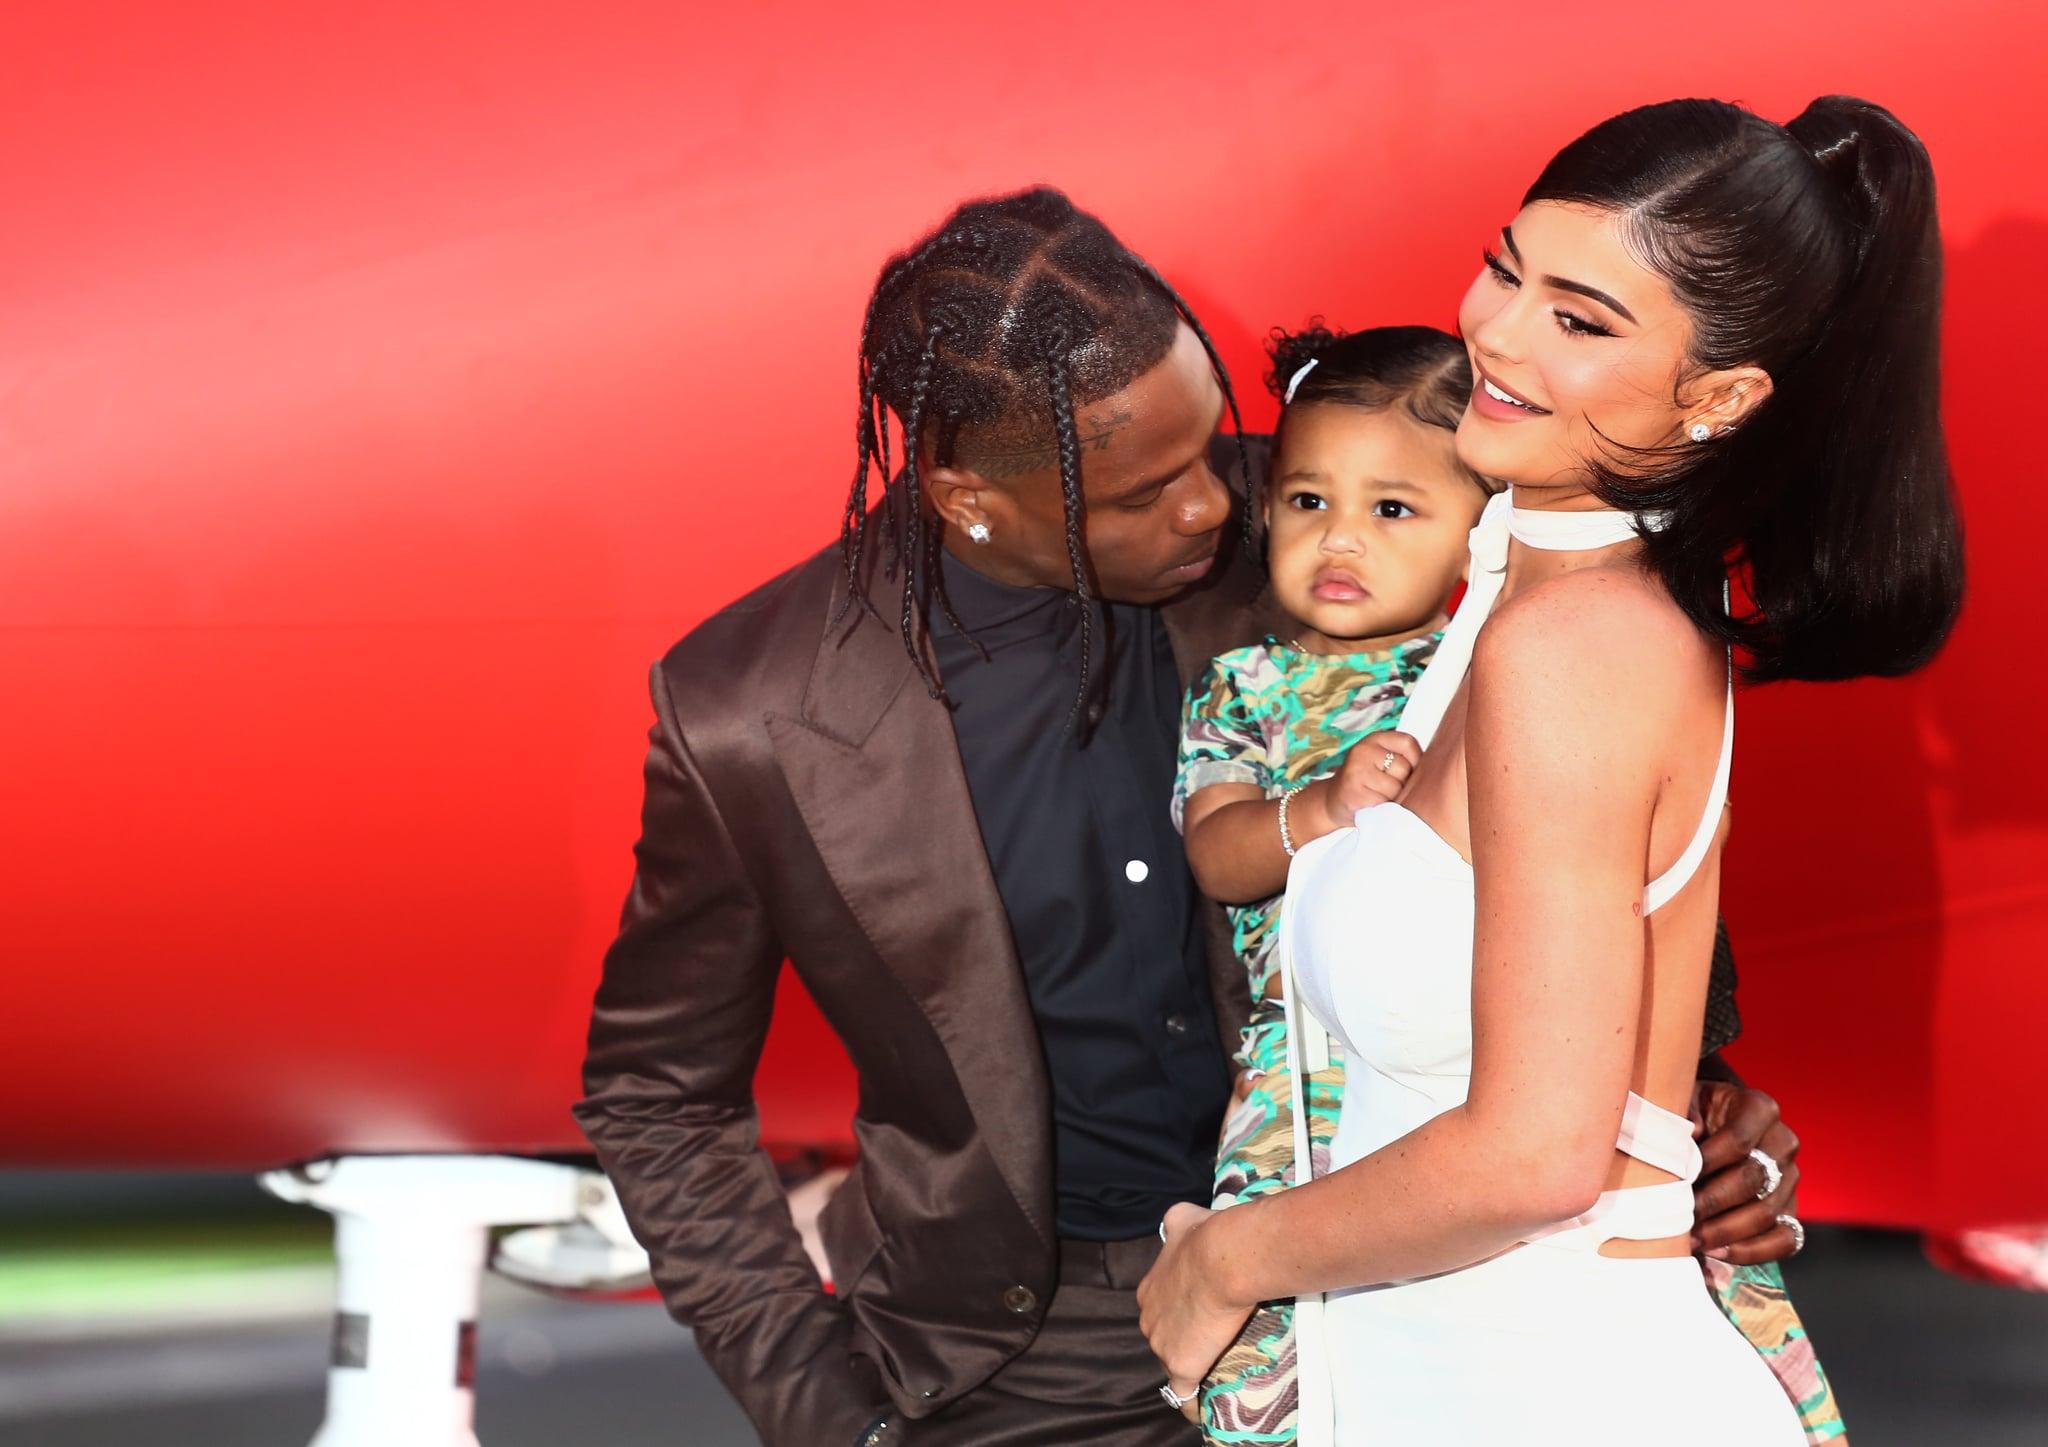 SANTA MONICA, CALIFORNIA - AUGUST 27: Travis Scott and Kylie Jenner attend the Travis Scott: